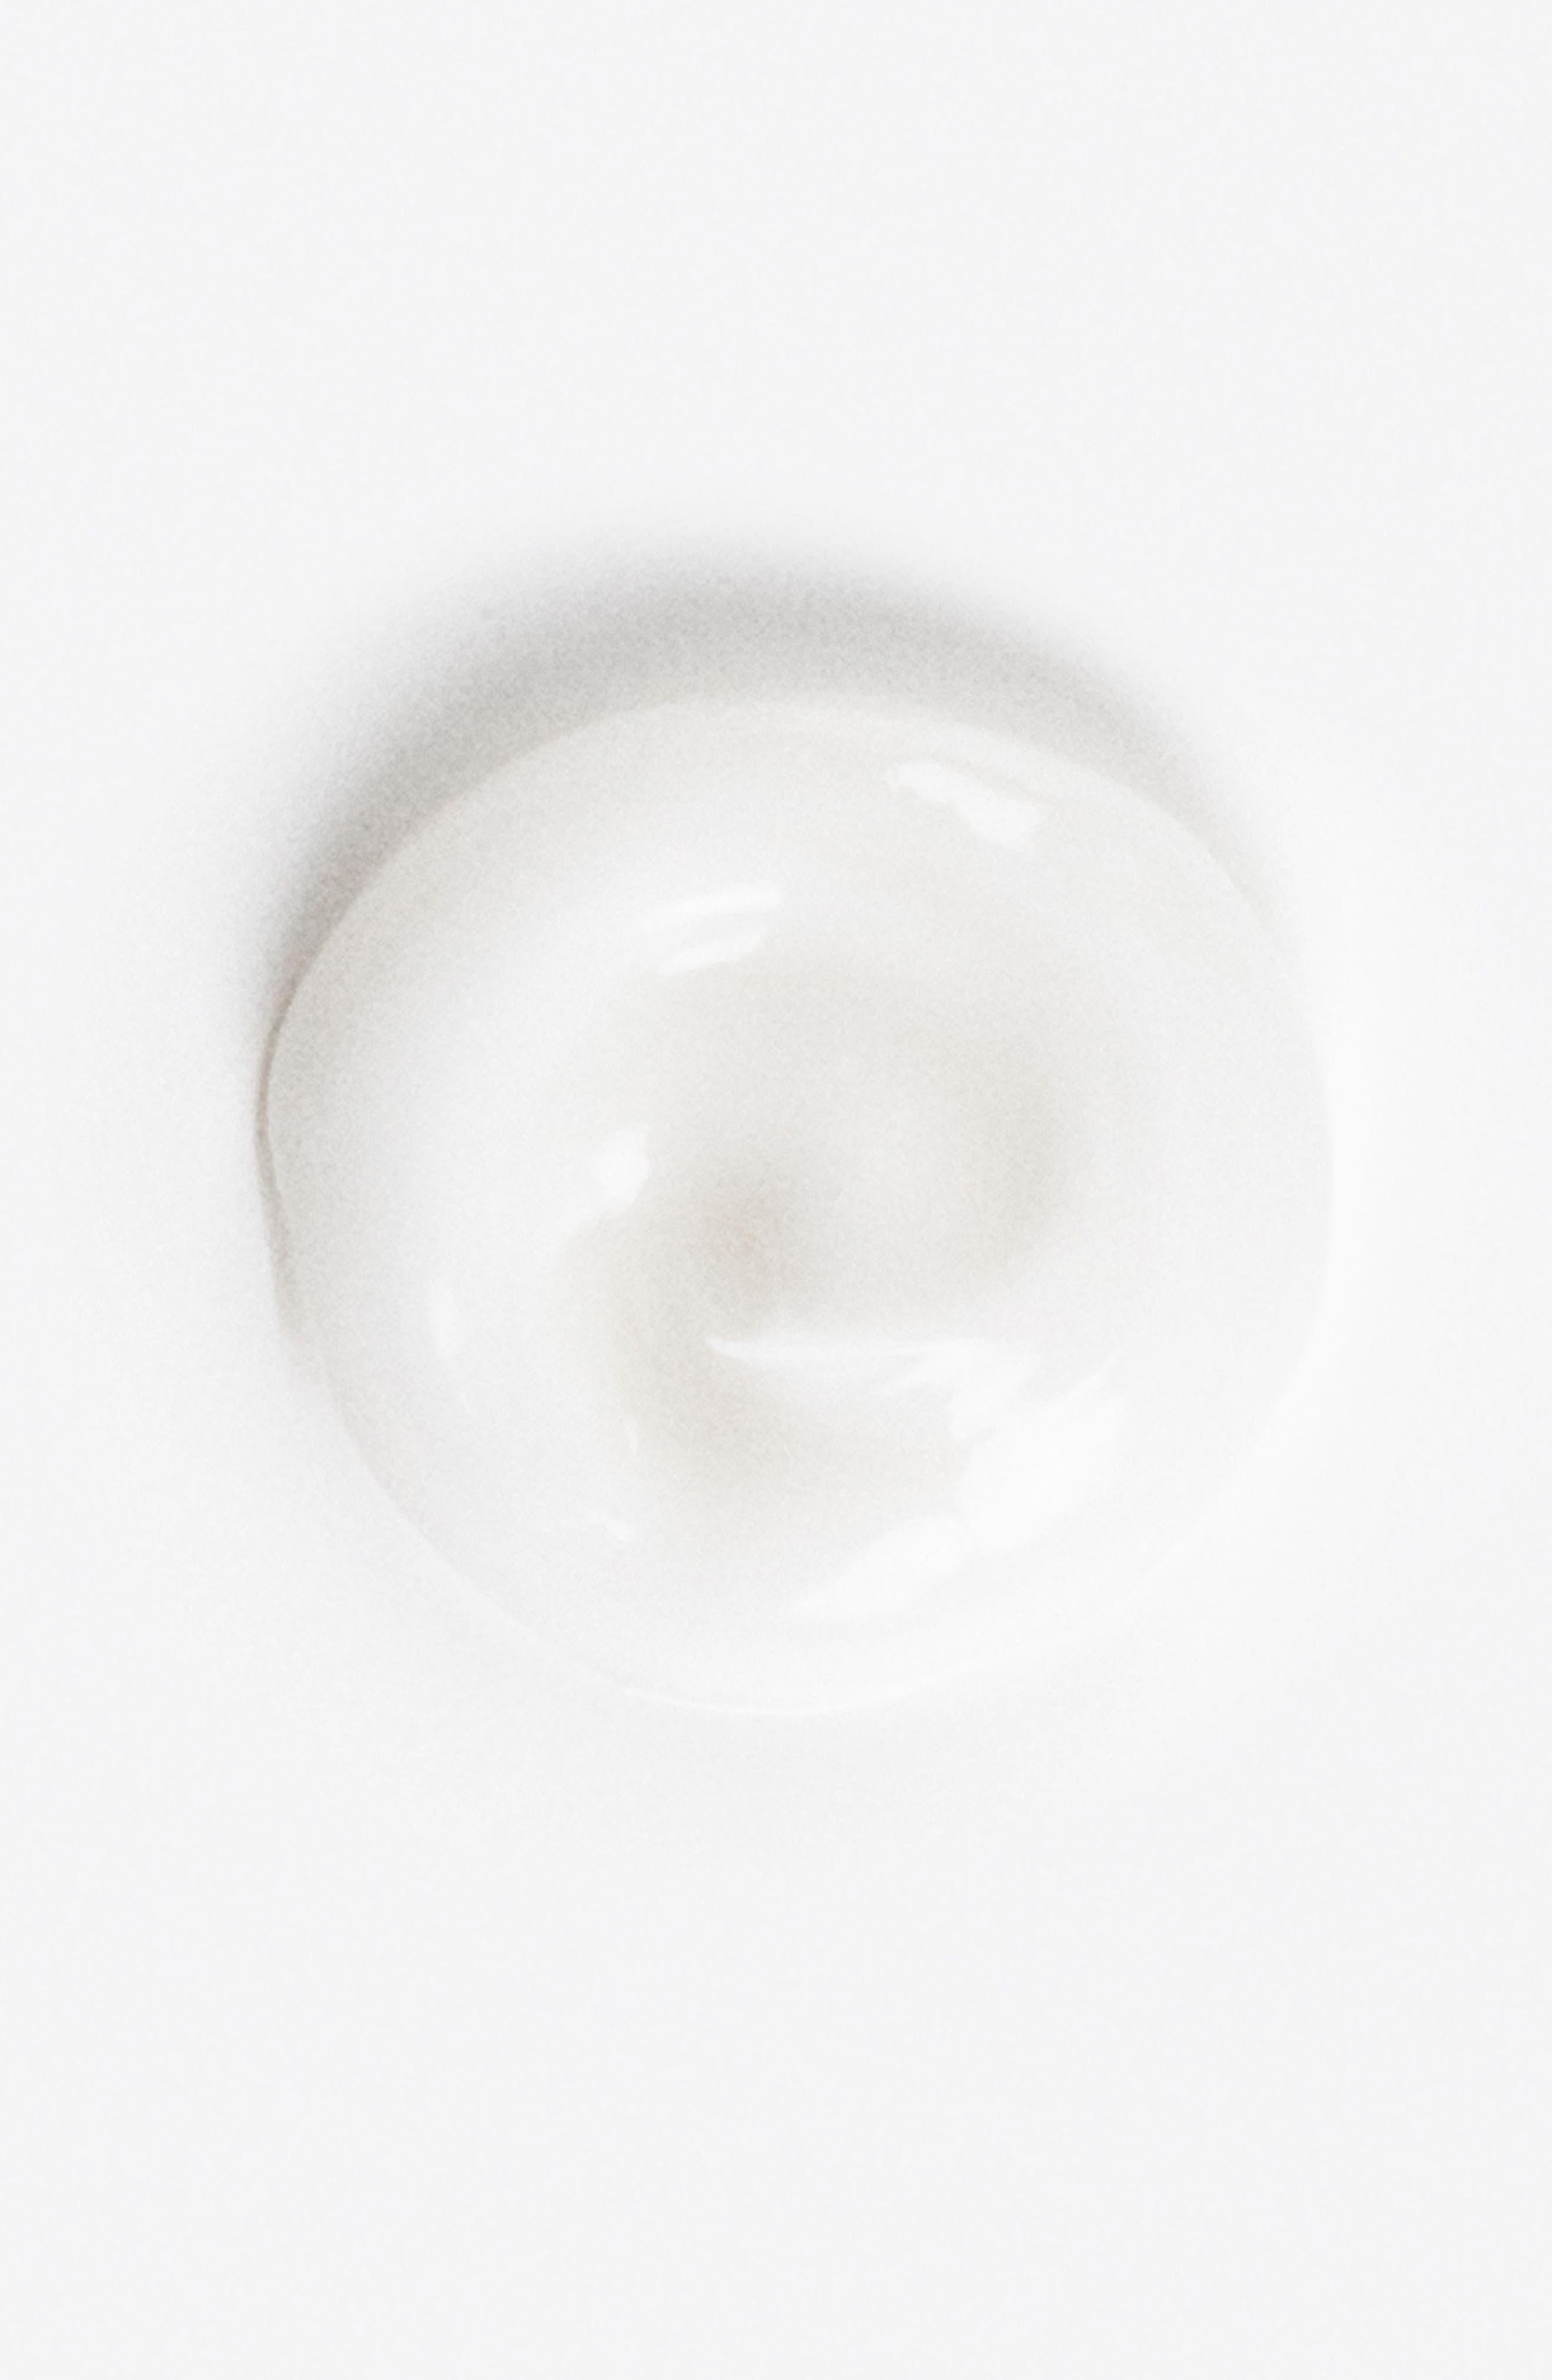 Olive Fruit Oil Nourishing Conditioner,                             Alternate thumbnail 2, color,                             NO COLOR